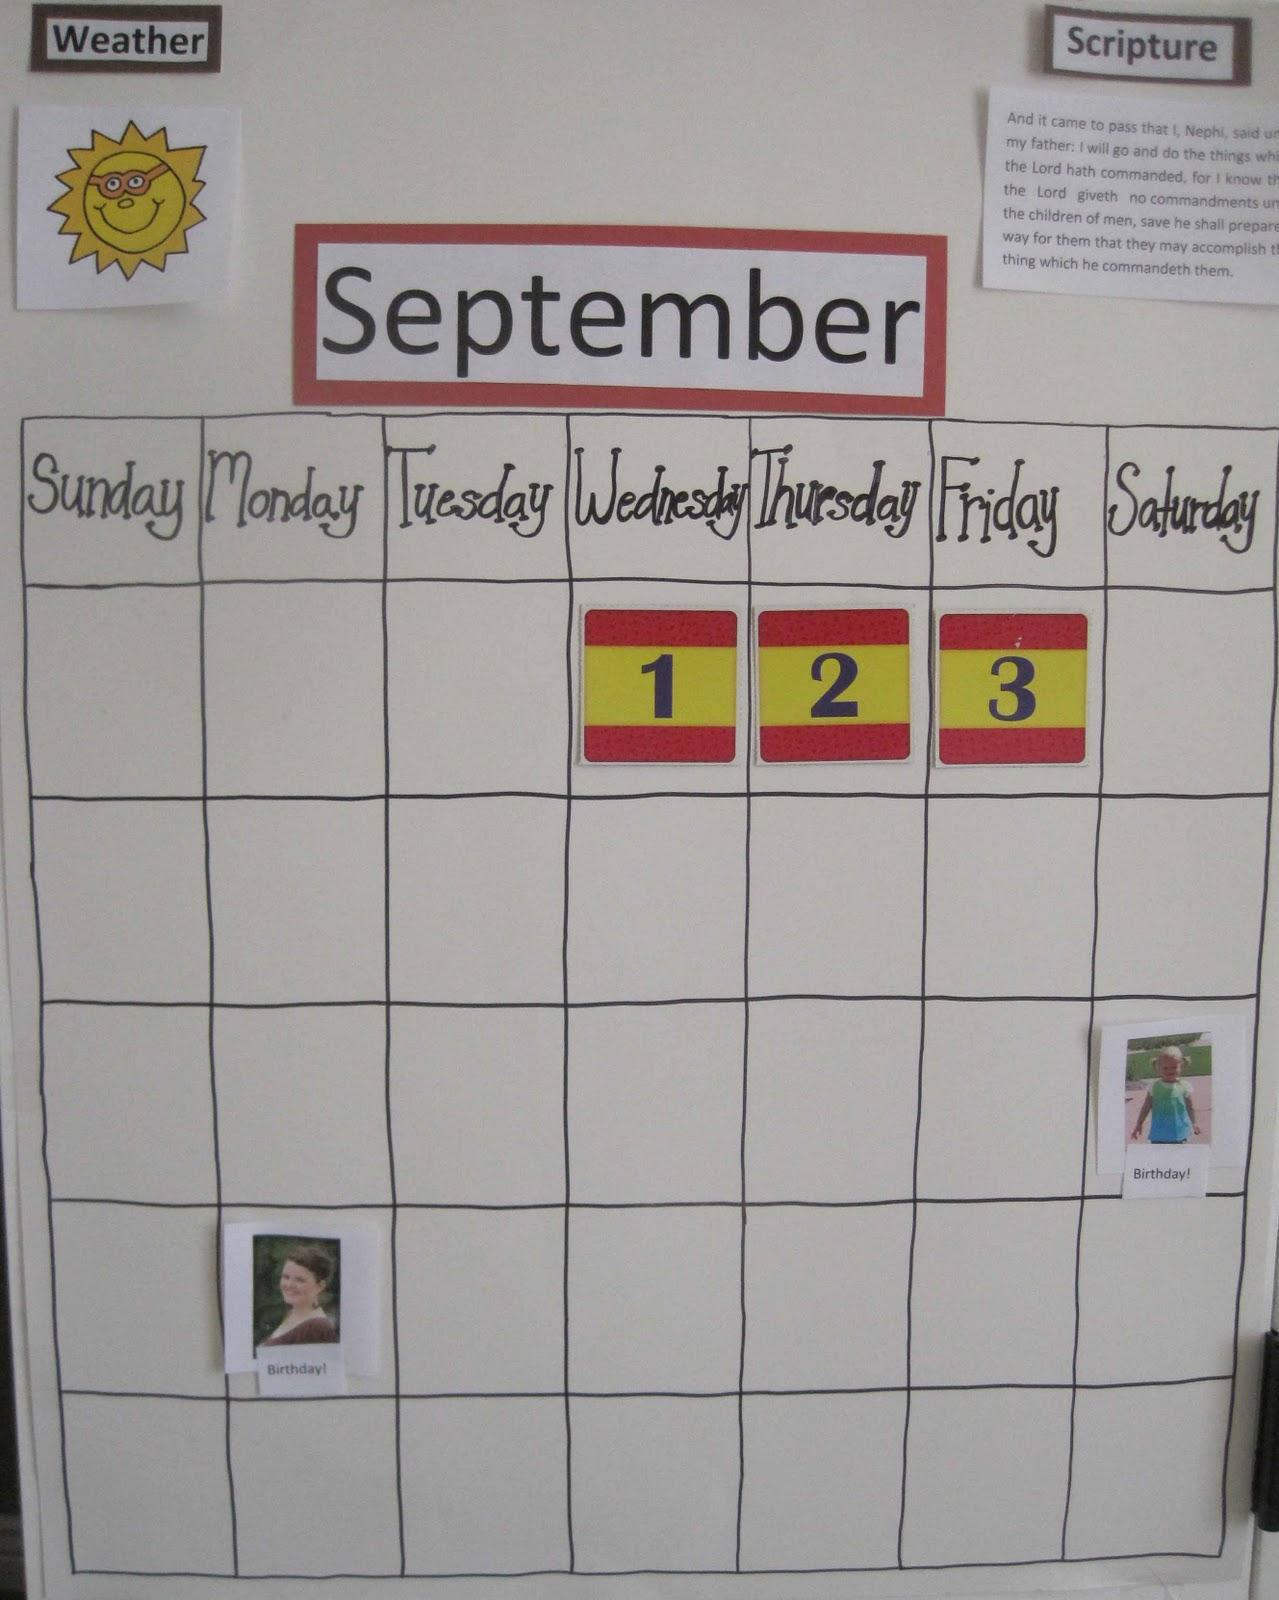 Calendar Ideas For Home : Children s learning activities home made calendar